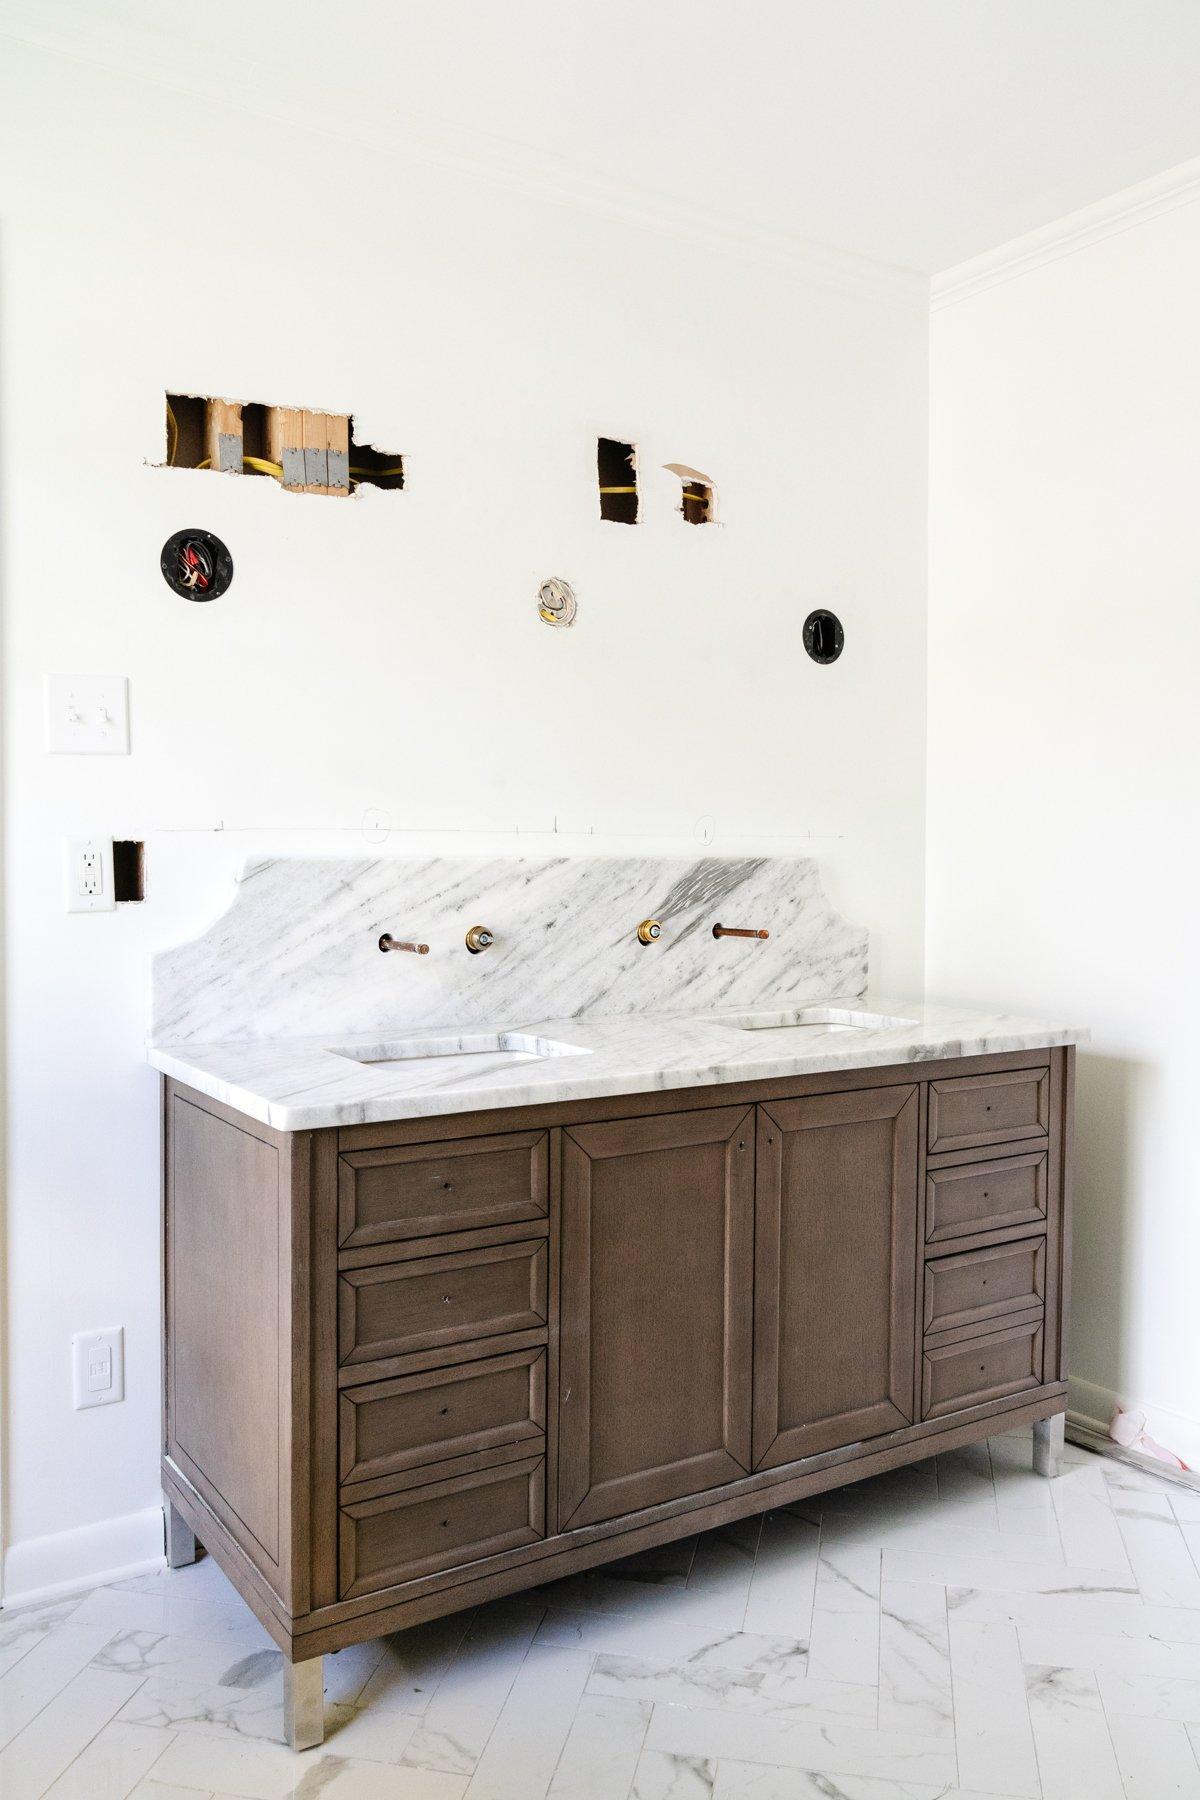 wood double vanity in a bathroom with scalloped marble backsplash and herringbone tile floor